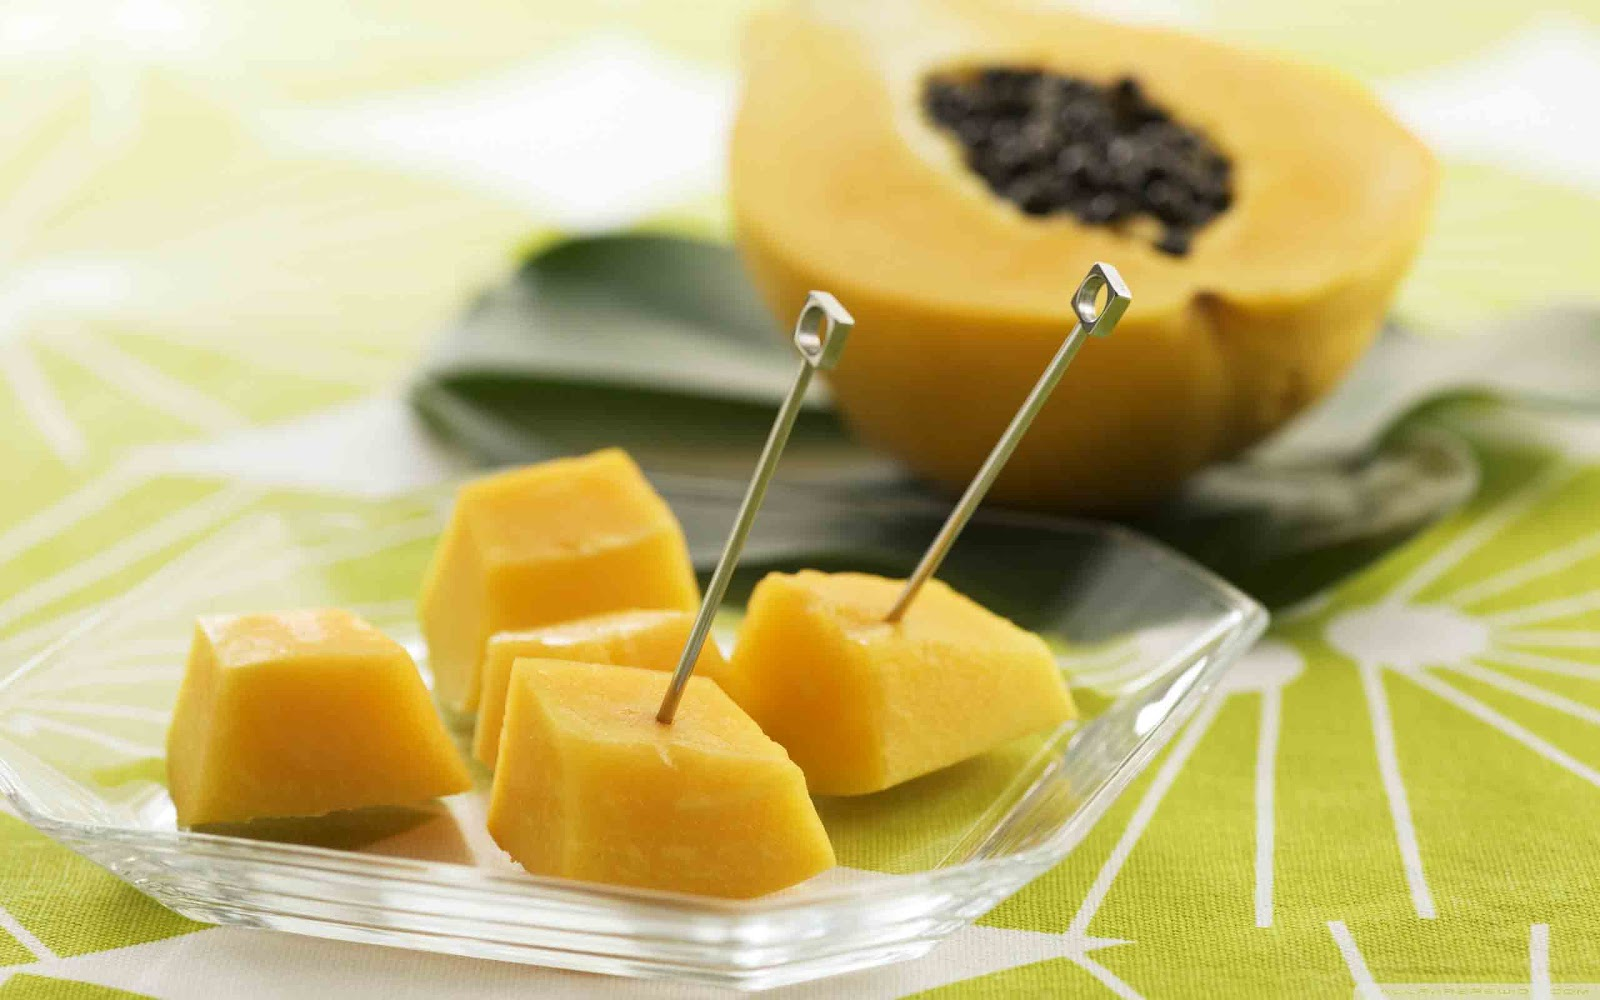 http://1.bp.blogspot.com/-EheY3IPH1qo/TzsyVhUpN8I/AAAAAAAAATk/prvtWoAdmVU/s1600/papaya_fruit-wallpaper-2560x1600.jpg